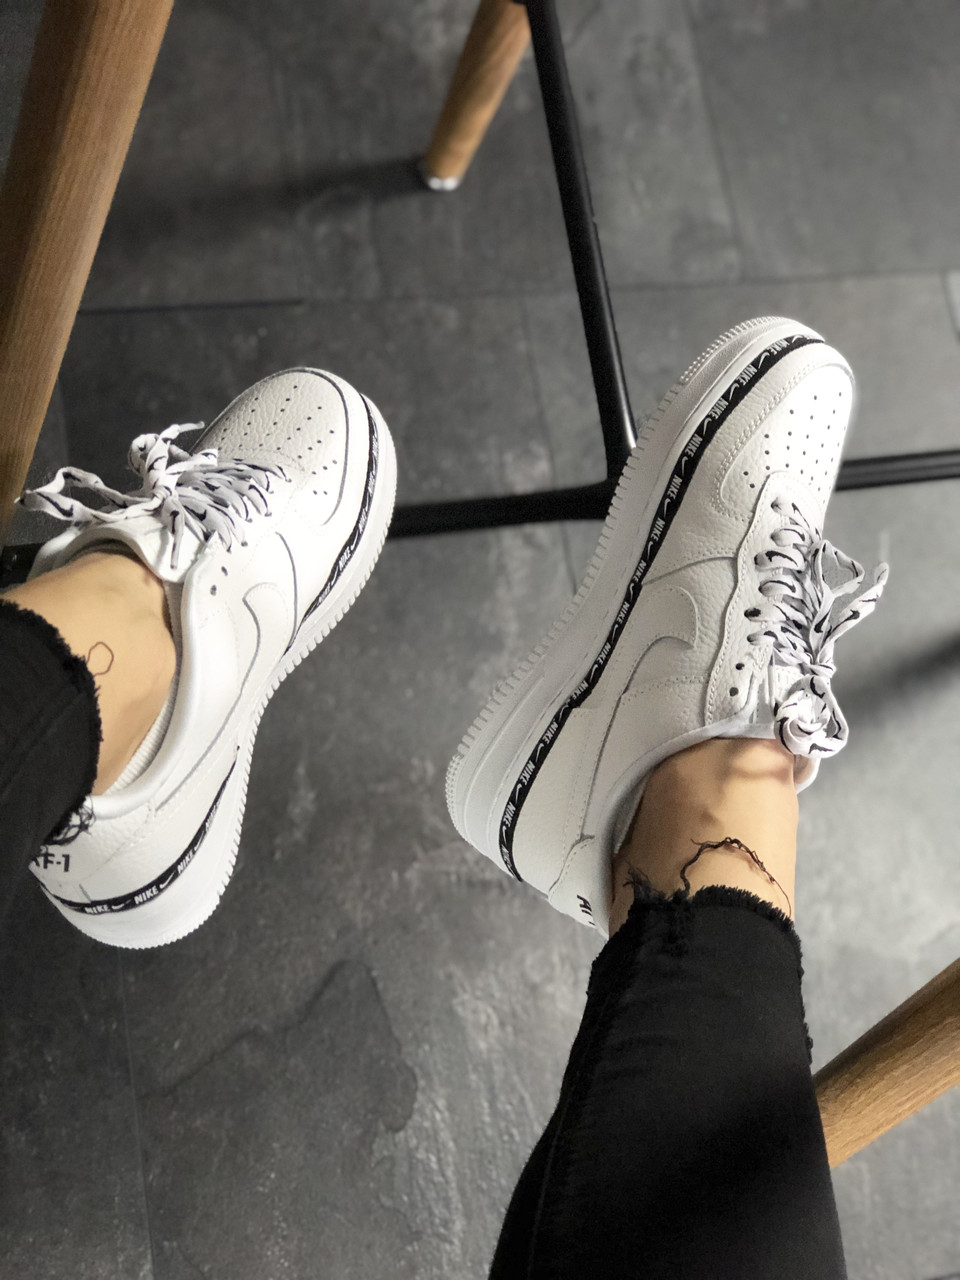 Кроссовки Nike Air Force 1 '07 Low SE Premium White Black 4